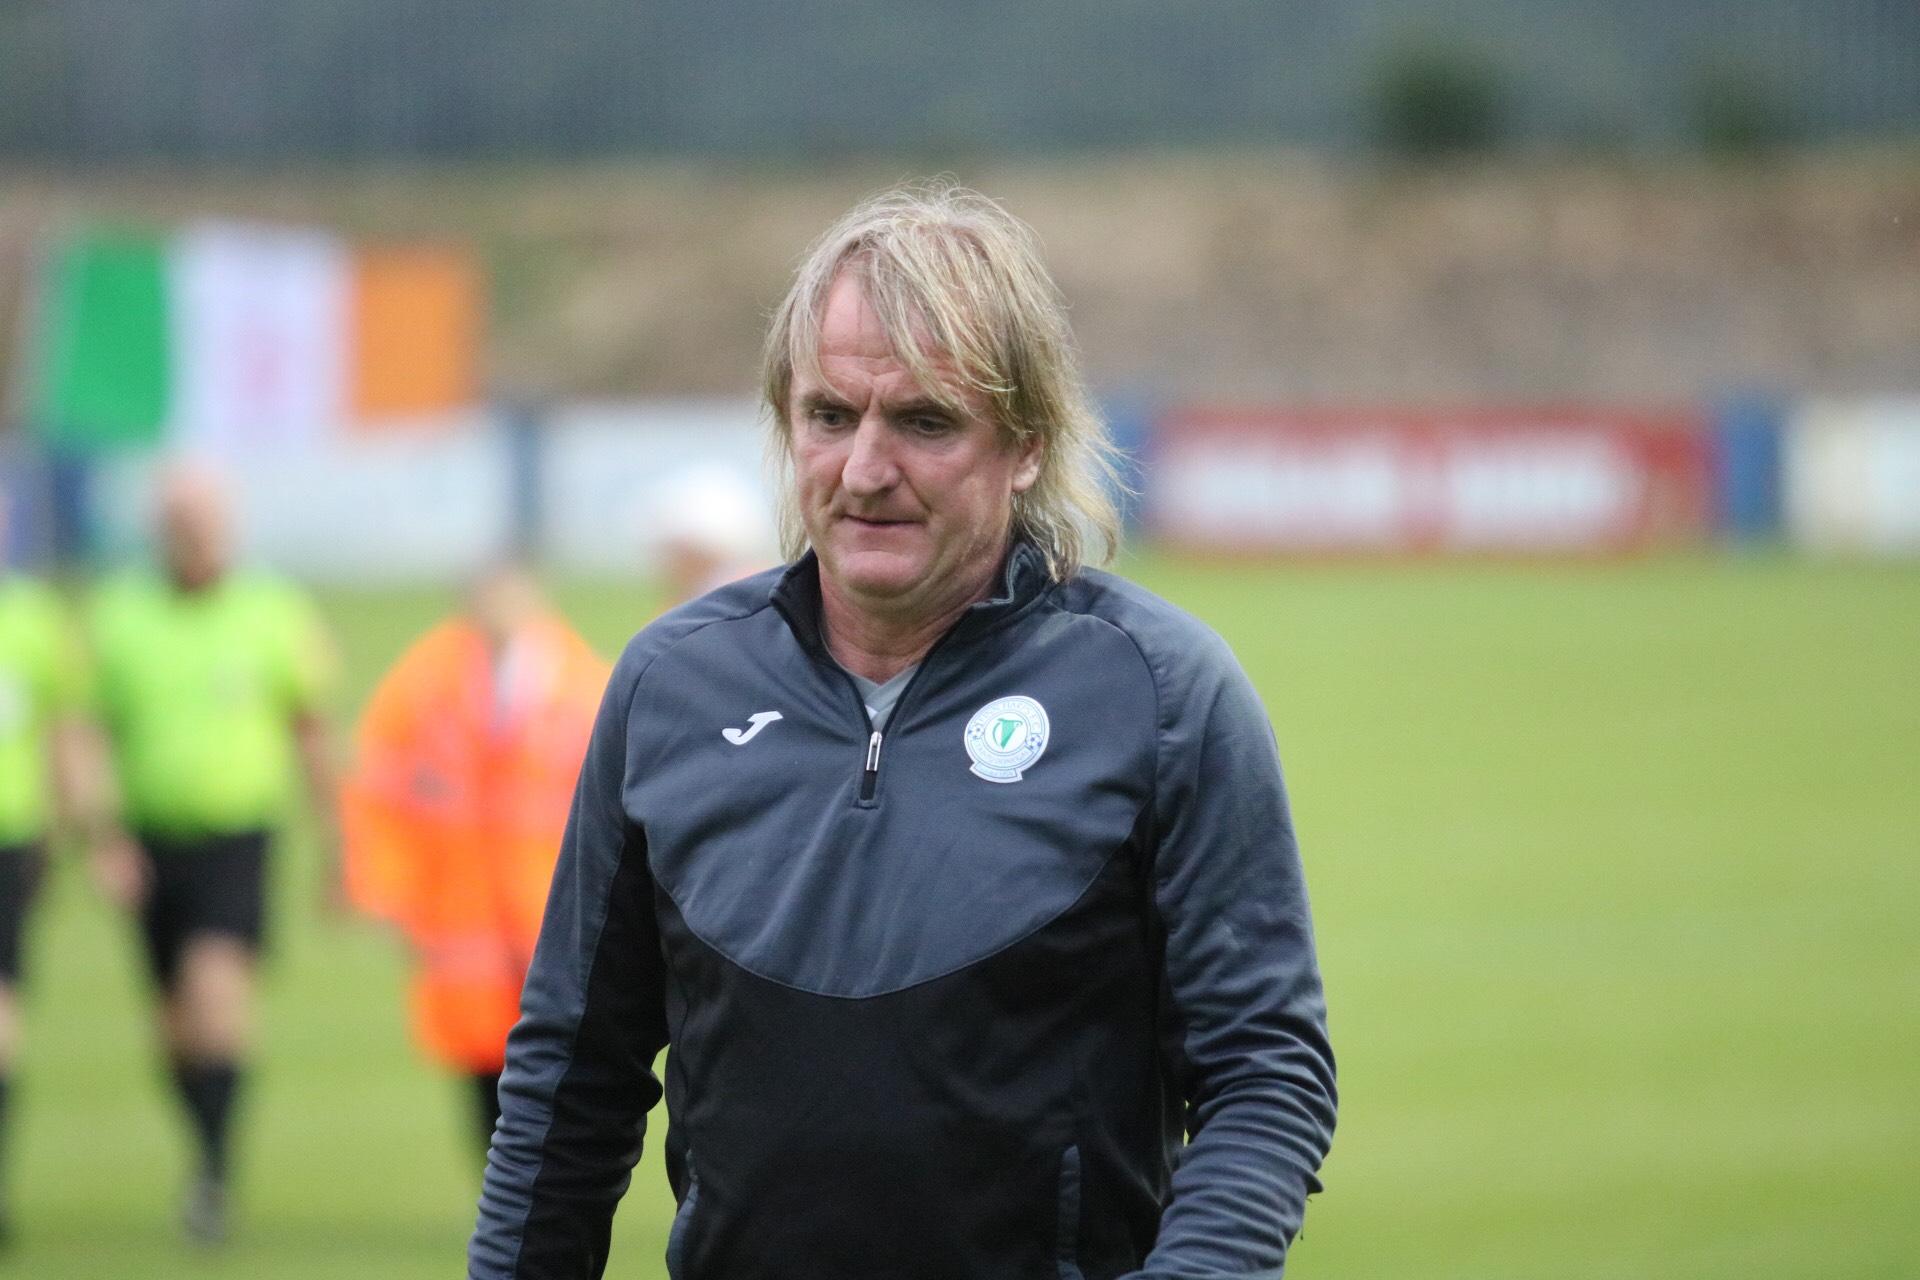 Ollie Horgan, Highland Radio Sports, Letterkenny, Donegal